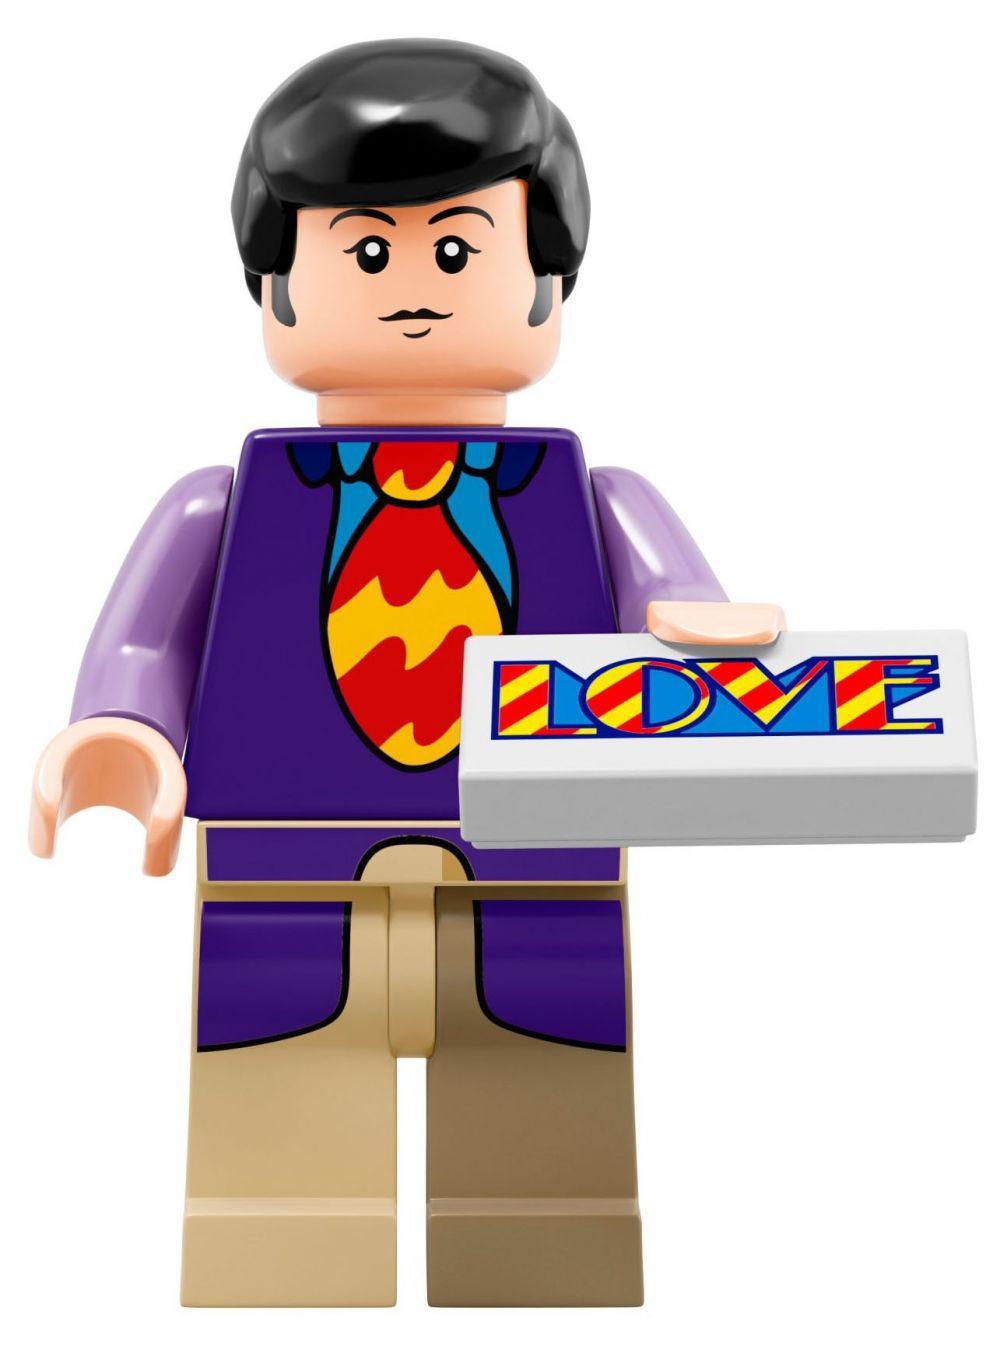 LEGO Ideas 21306 pas cher, The Beatles Yellow Submarine